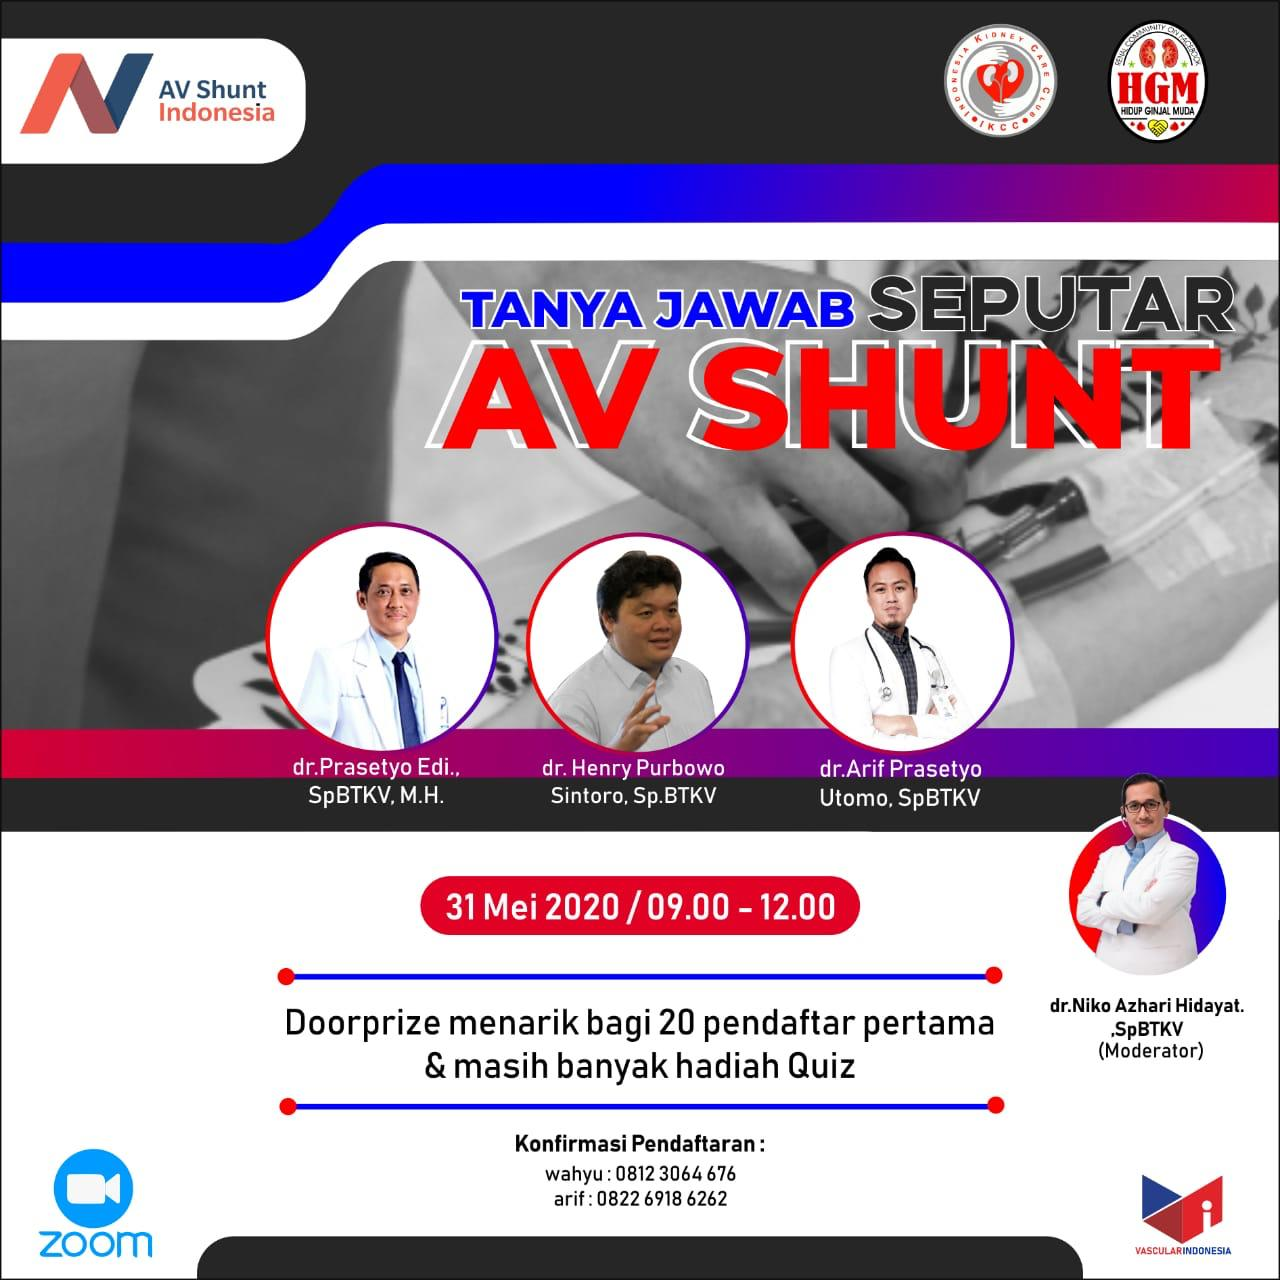 https://avshuntindonesia.com/images/blog/BLOG__webinar-avshunt-indonesia--tanya-jawab-seputar-avshunt--chapter-1__20200601102716.jpg